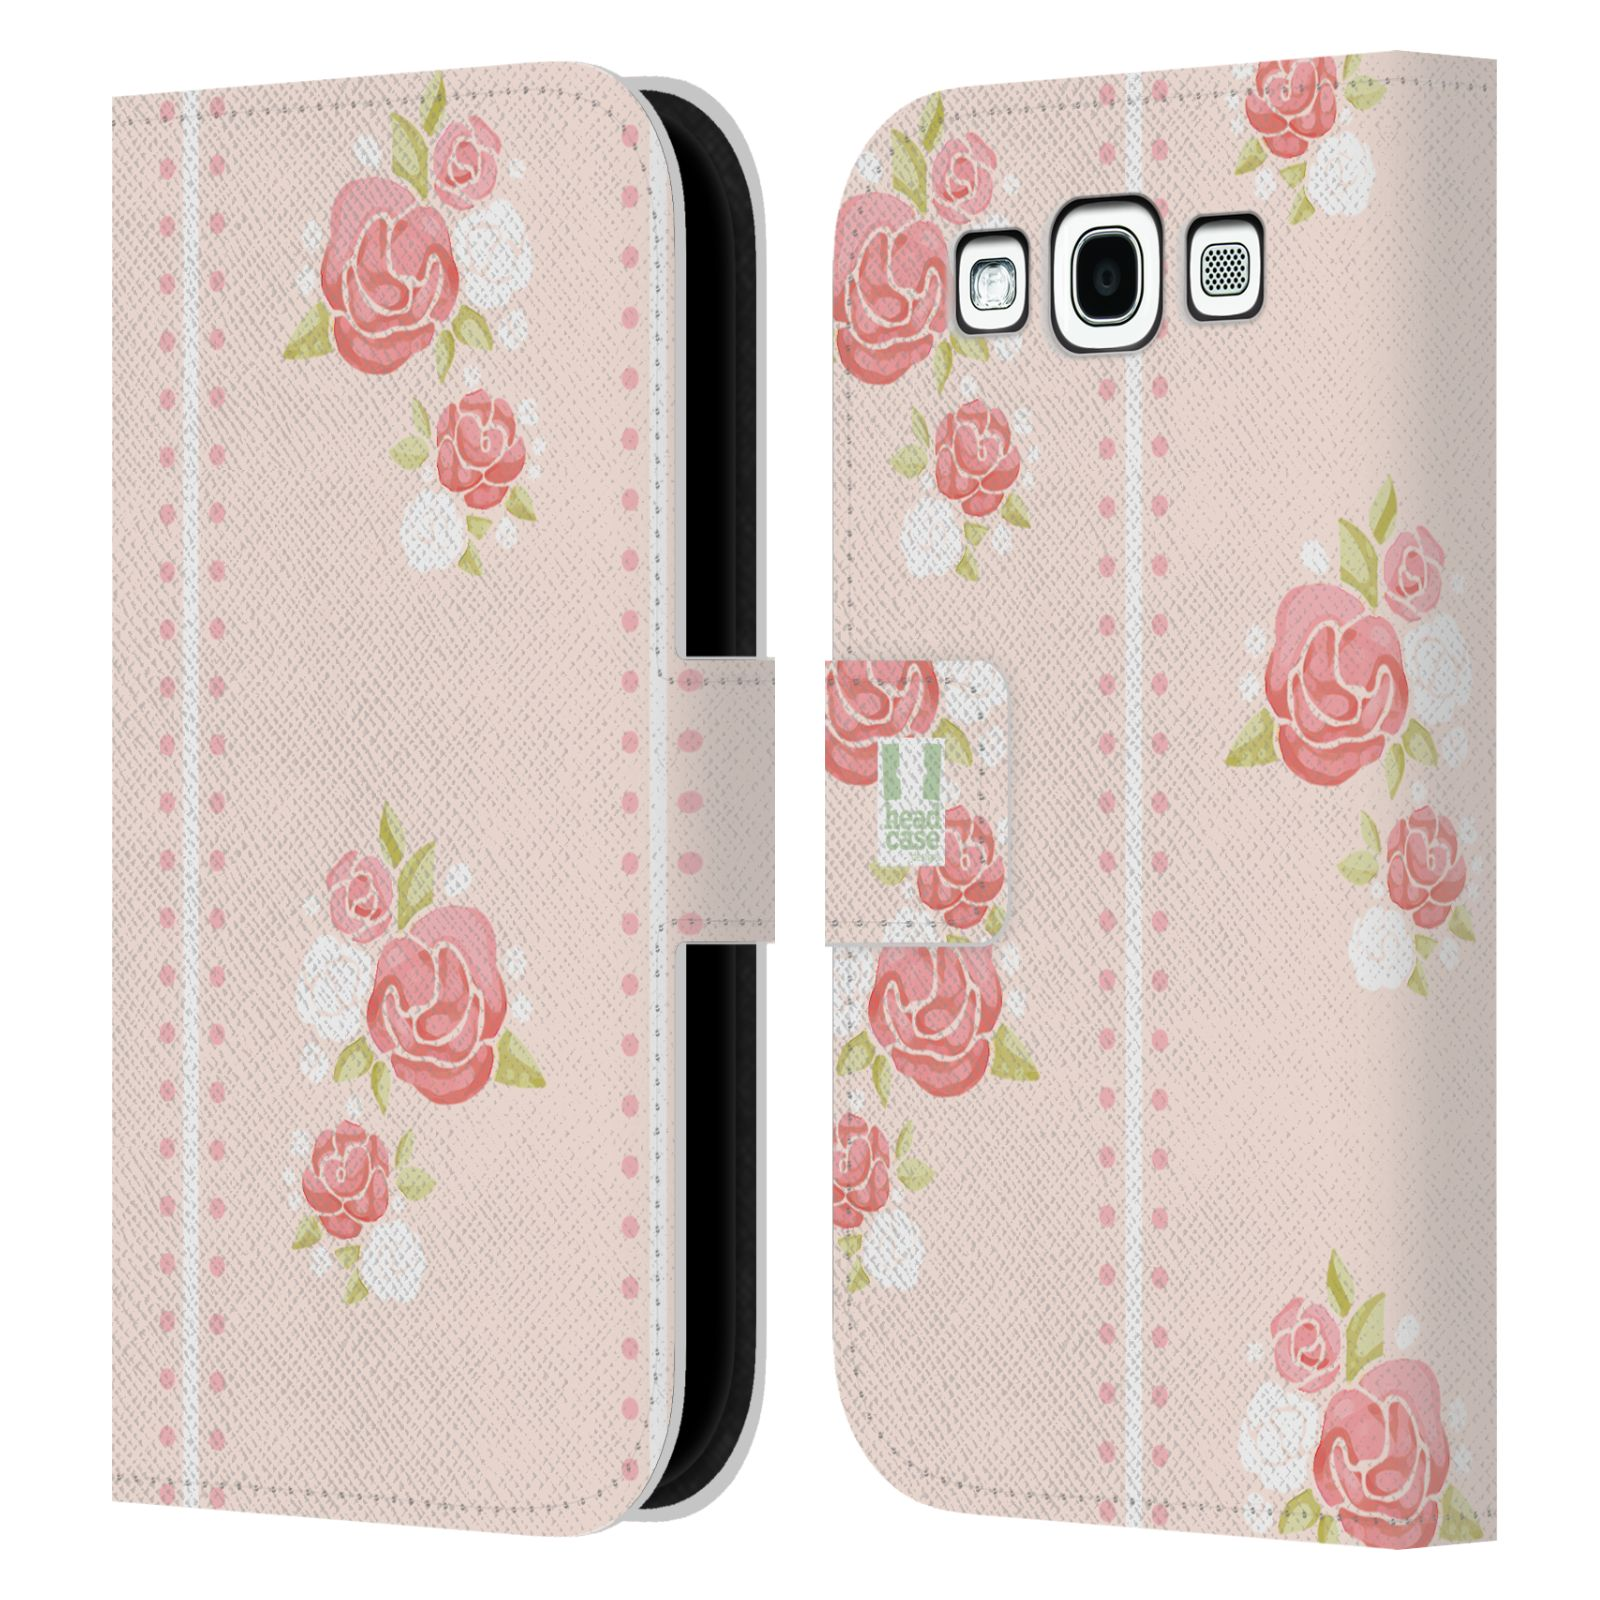 HEAD CASE Flipové pouzdro pro mobil Samsung Galaxy S3 Francouzský venkov pruhy a růže růžová barva